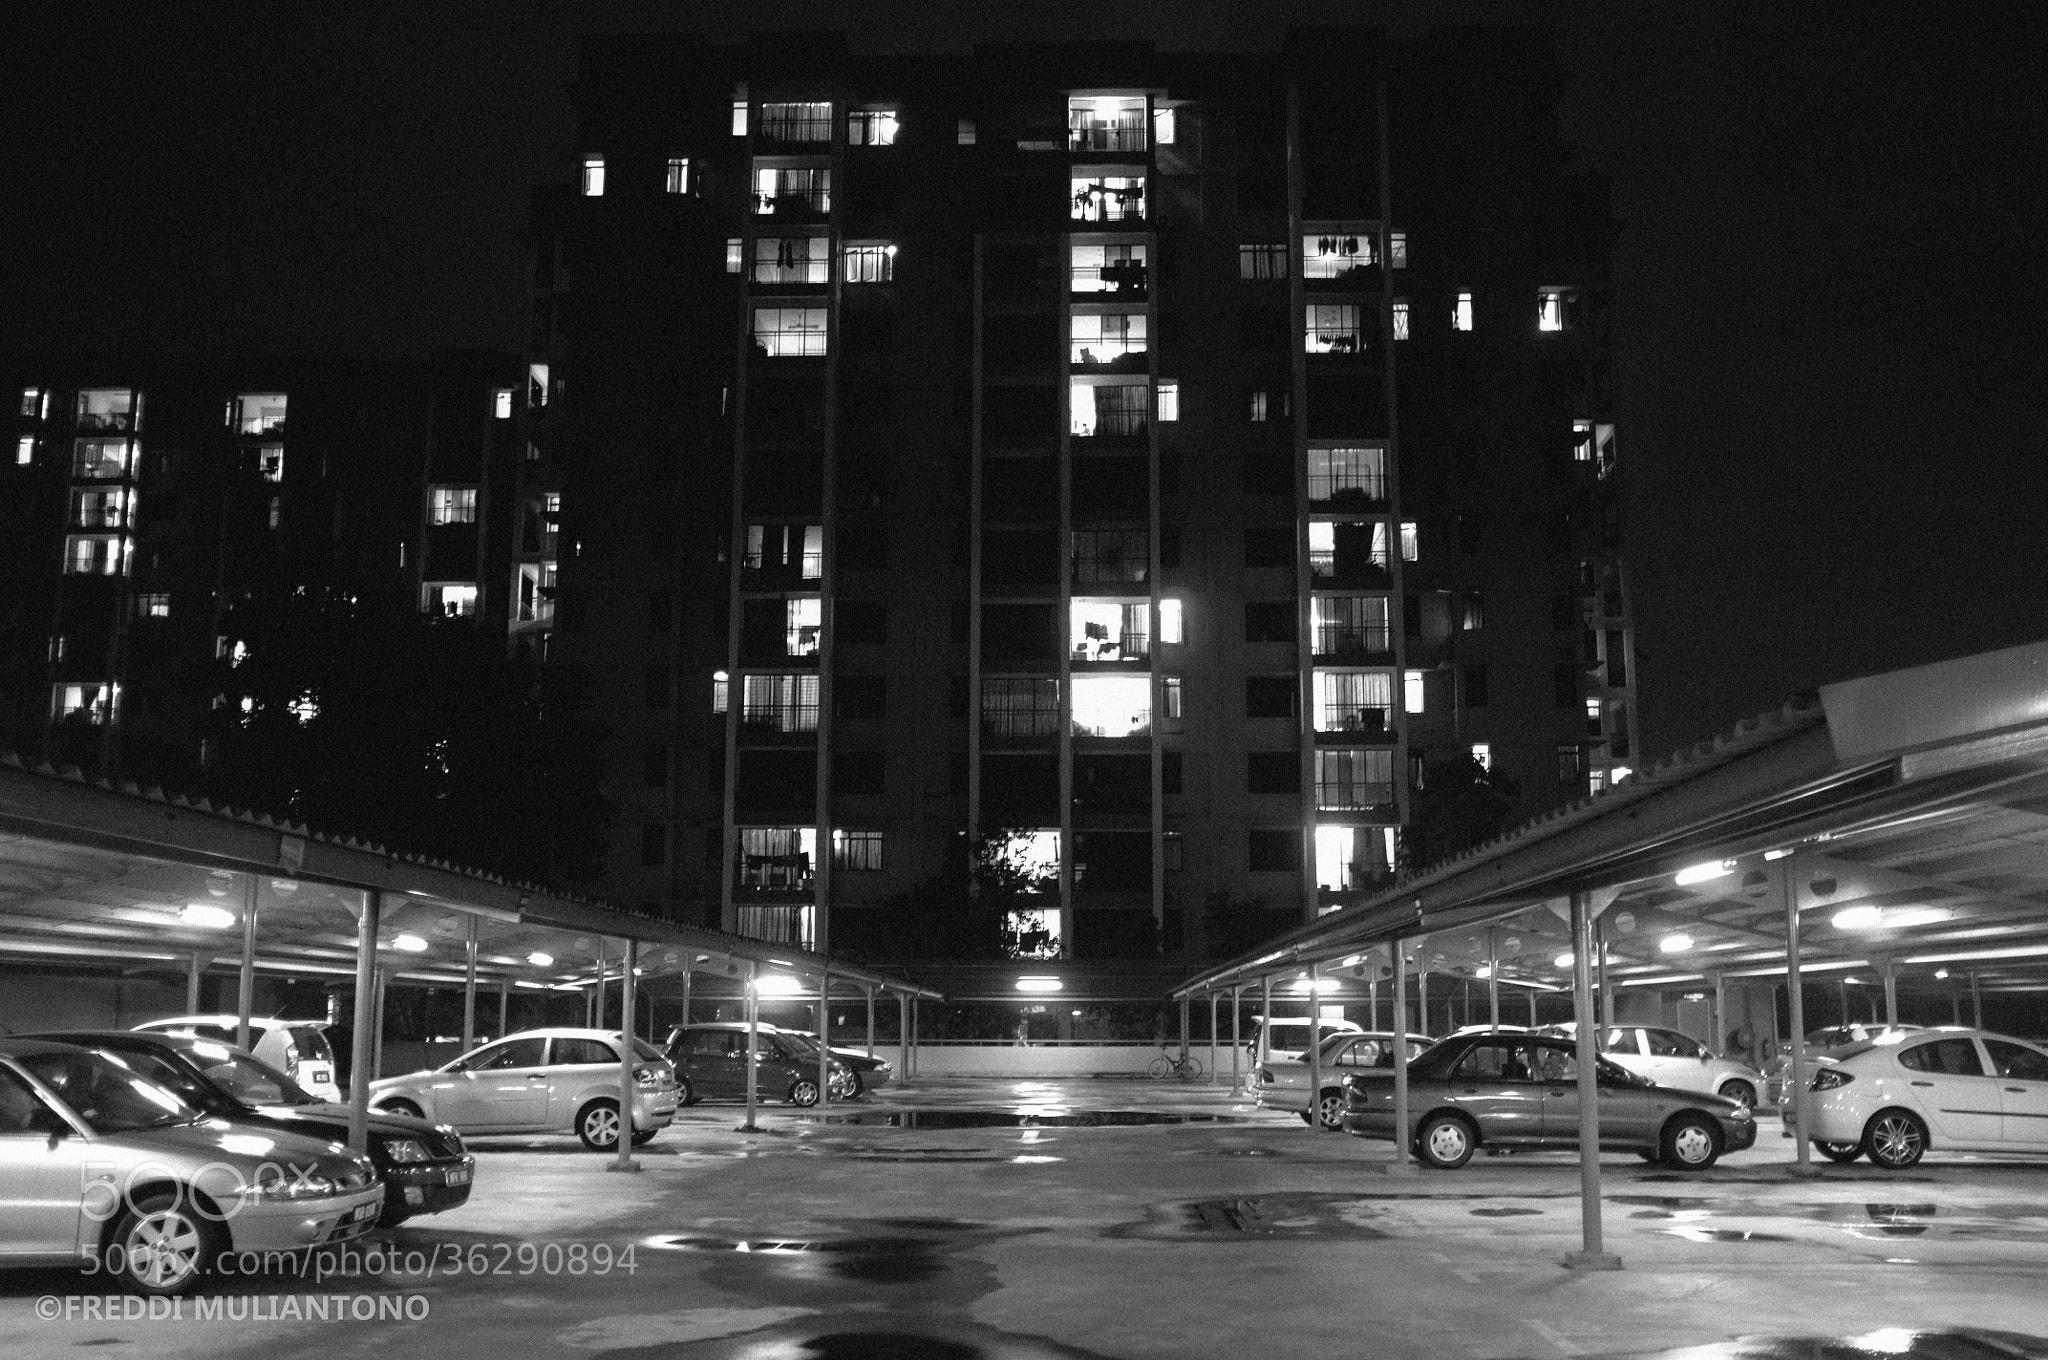 Photograph Cyberia B2 Parking Lot At Night by Freddi Muliantono on 500px